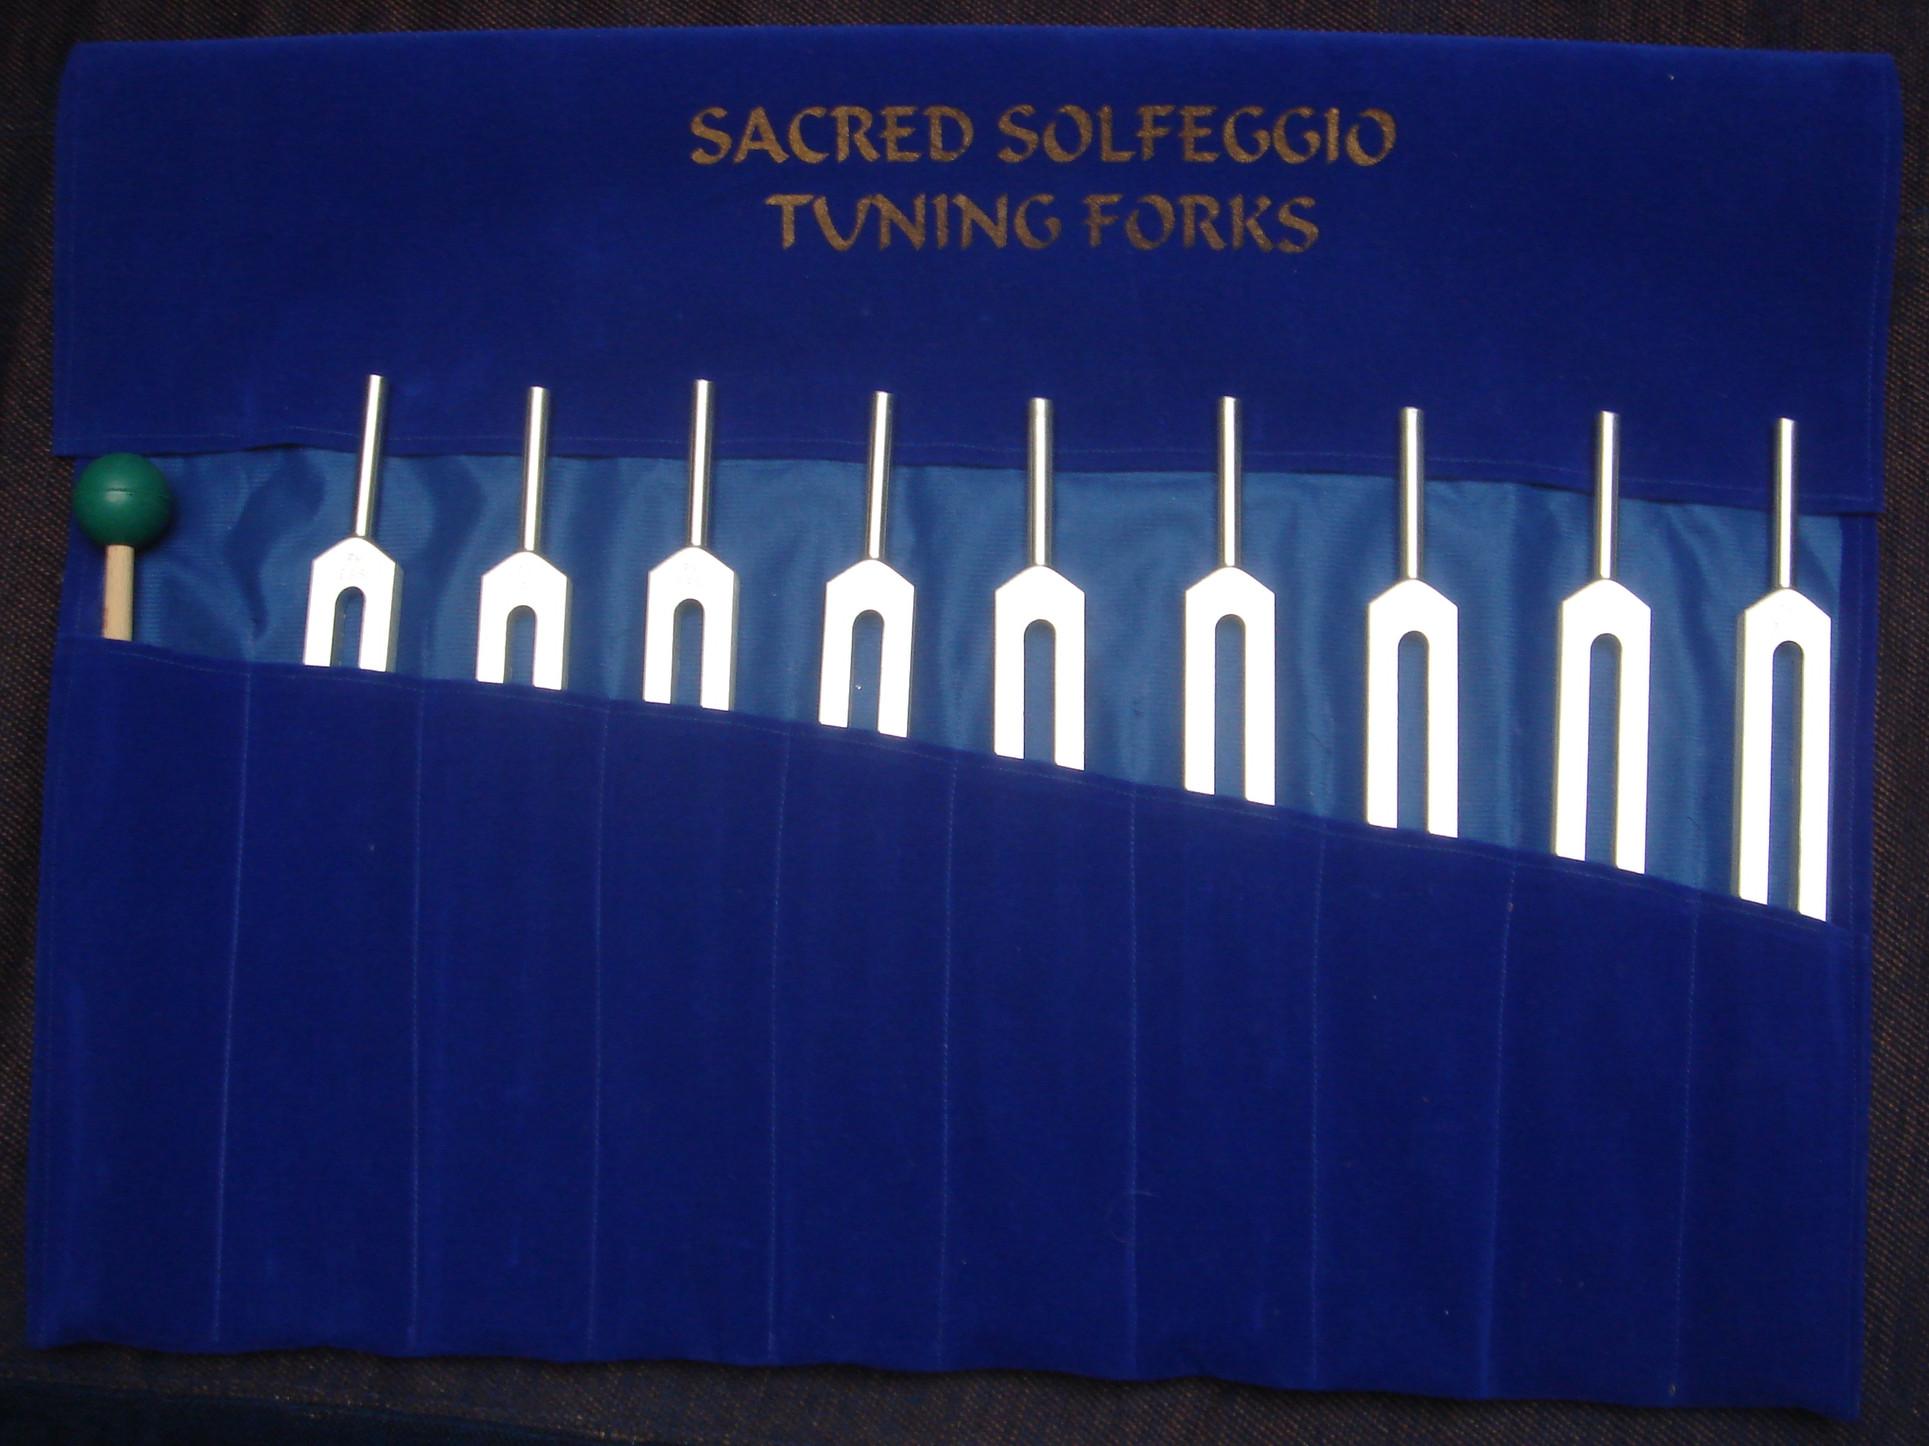 Sacred_solferggio_tuning_forks